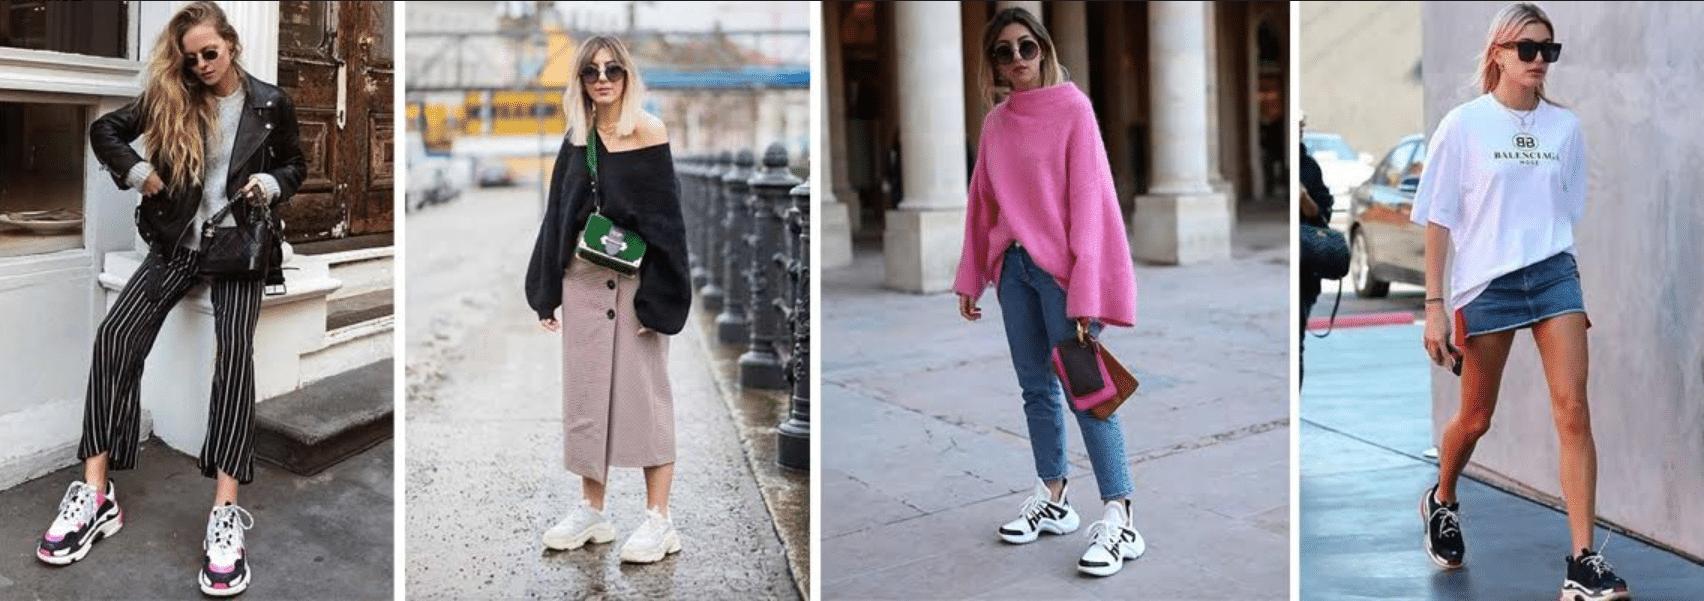 quatro modelos usando modelos diferentes de tenis tipo sneaker